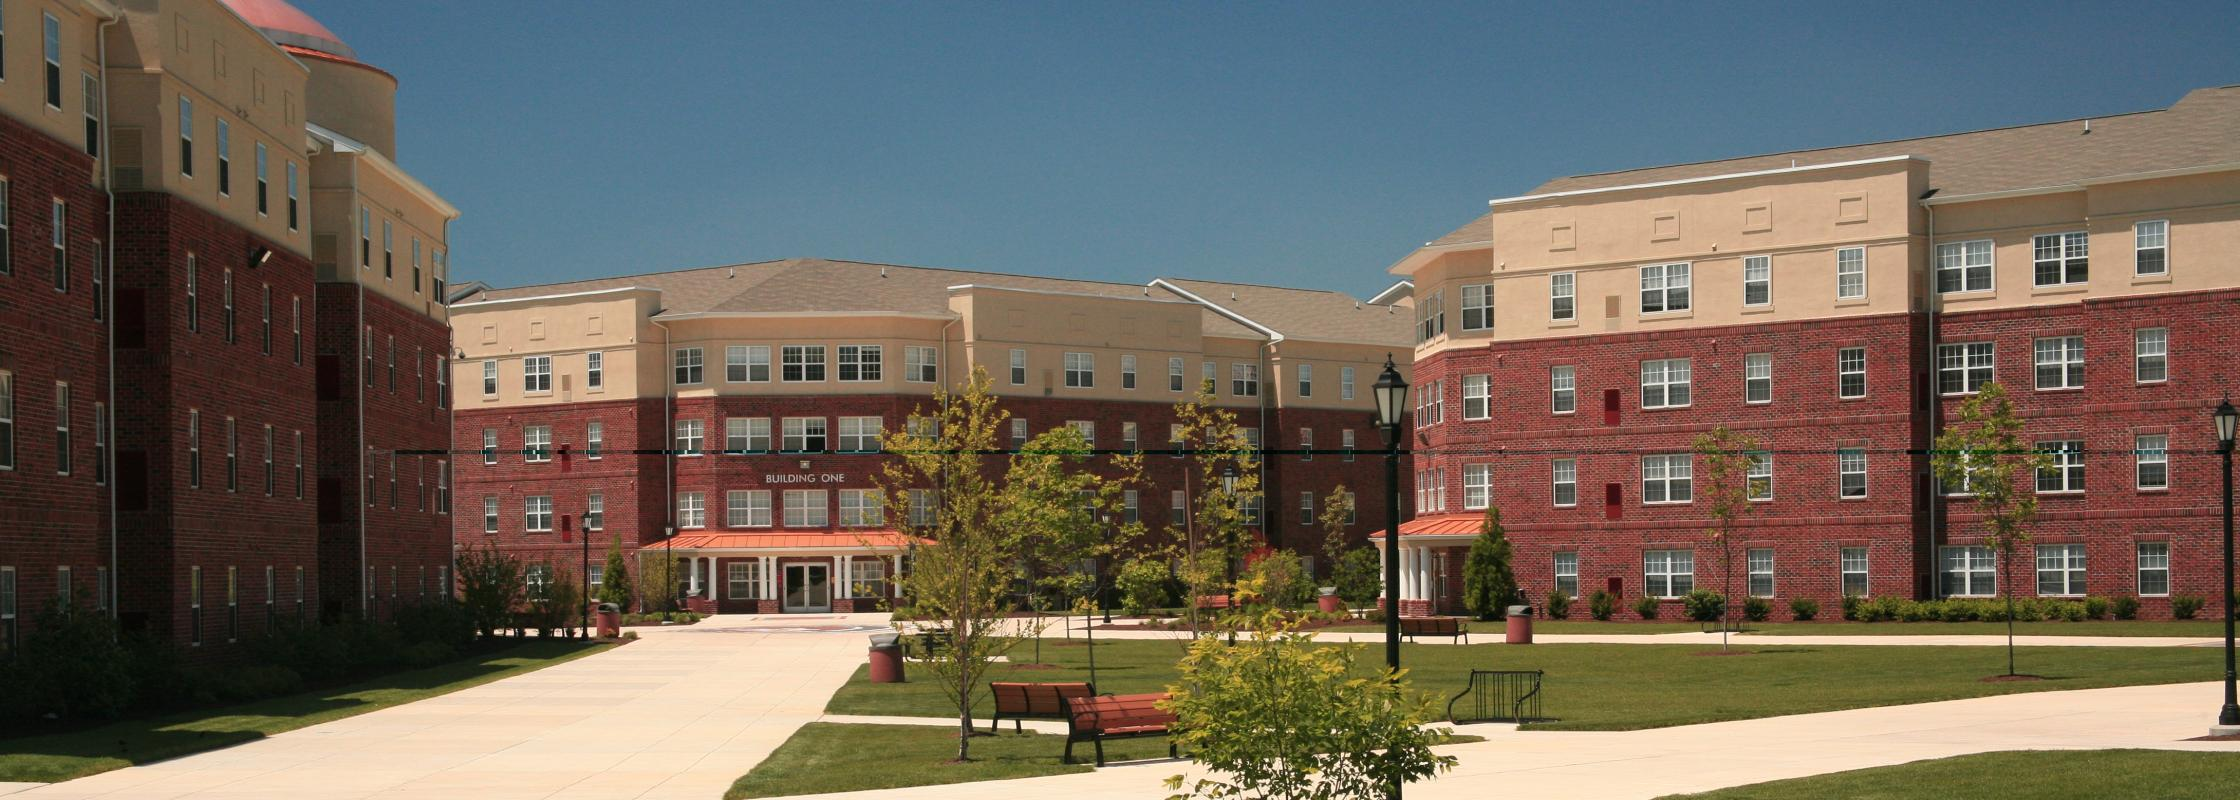 University Village at Delaware State University